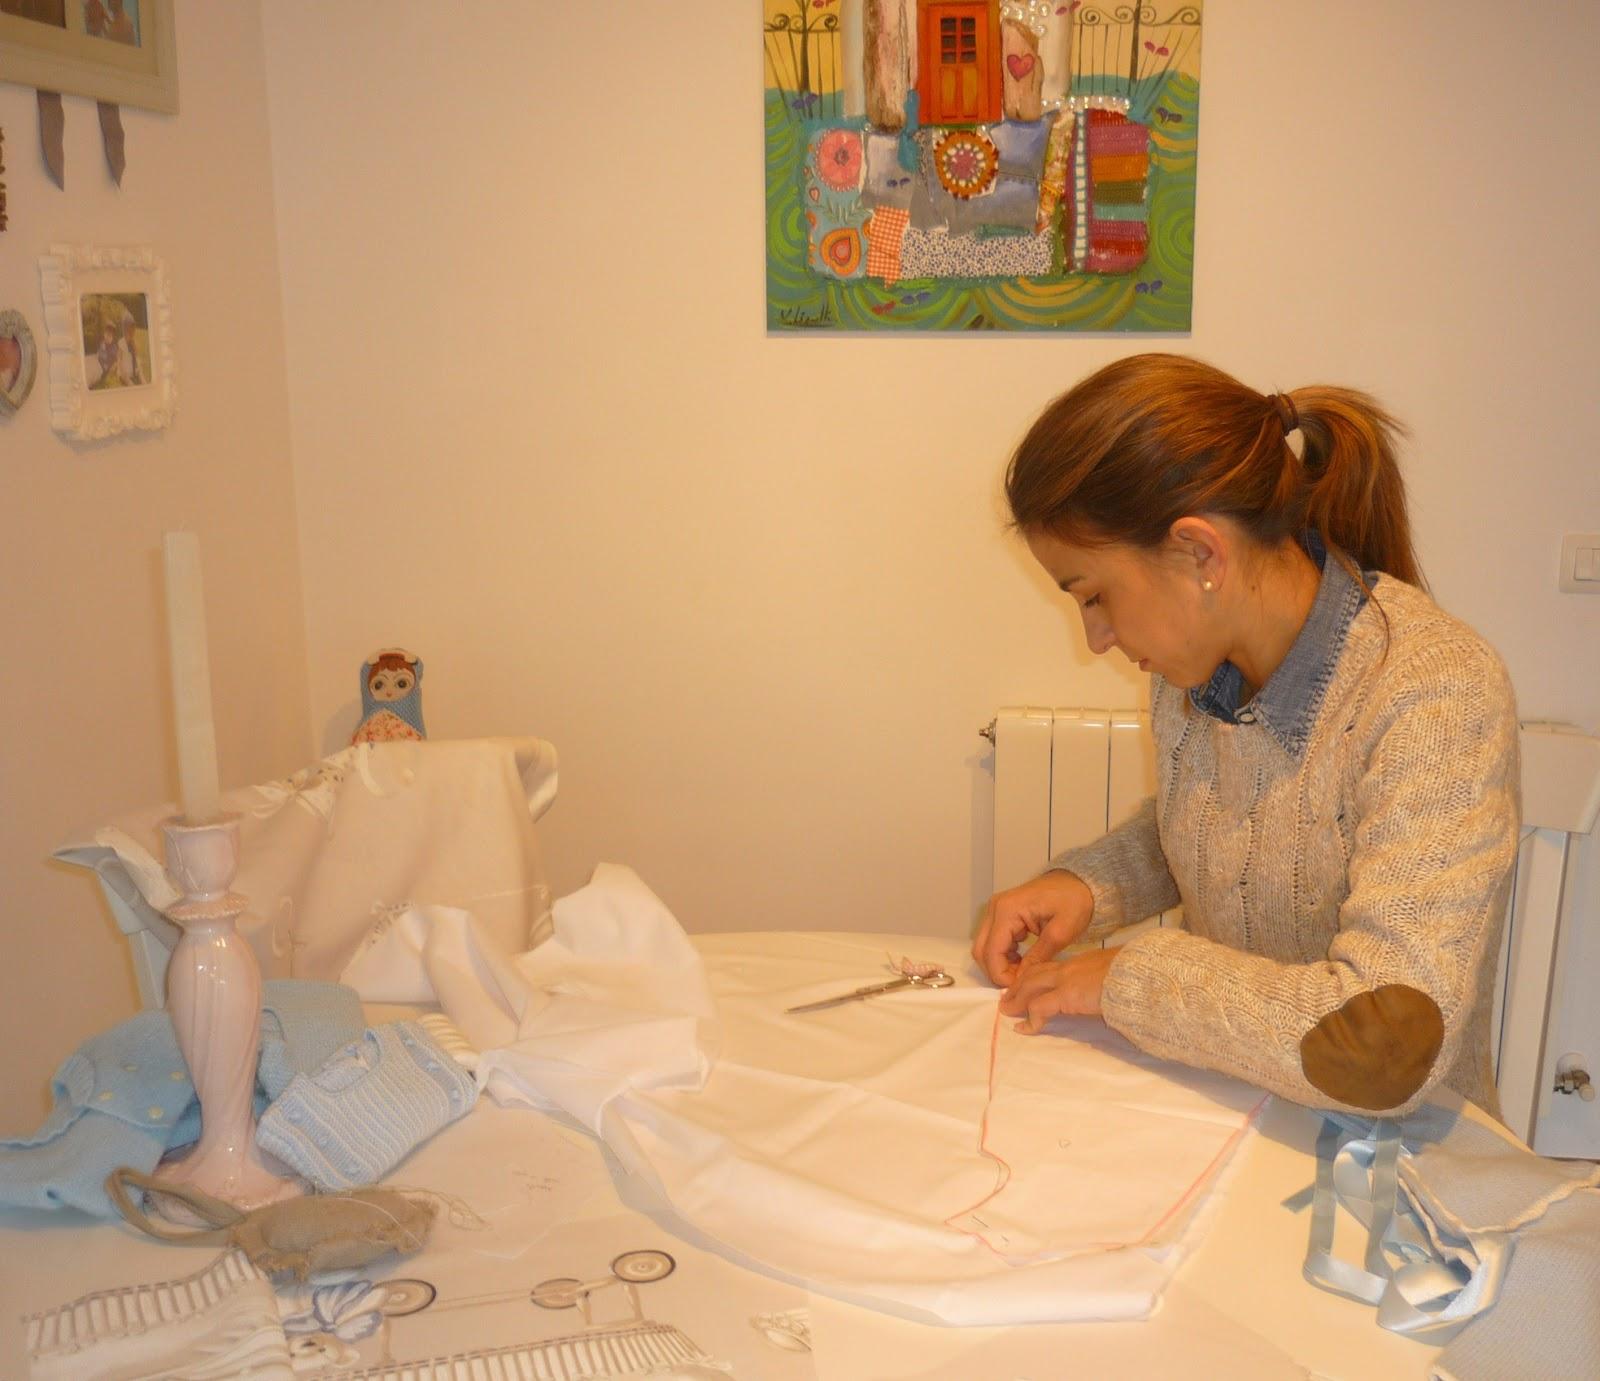 El taller el taller de merime - El taller de pinero ...